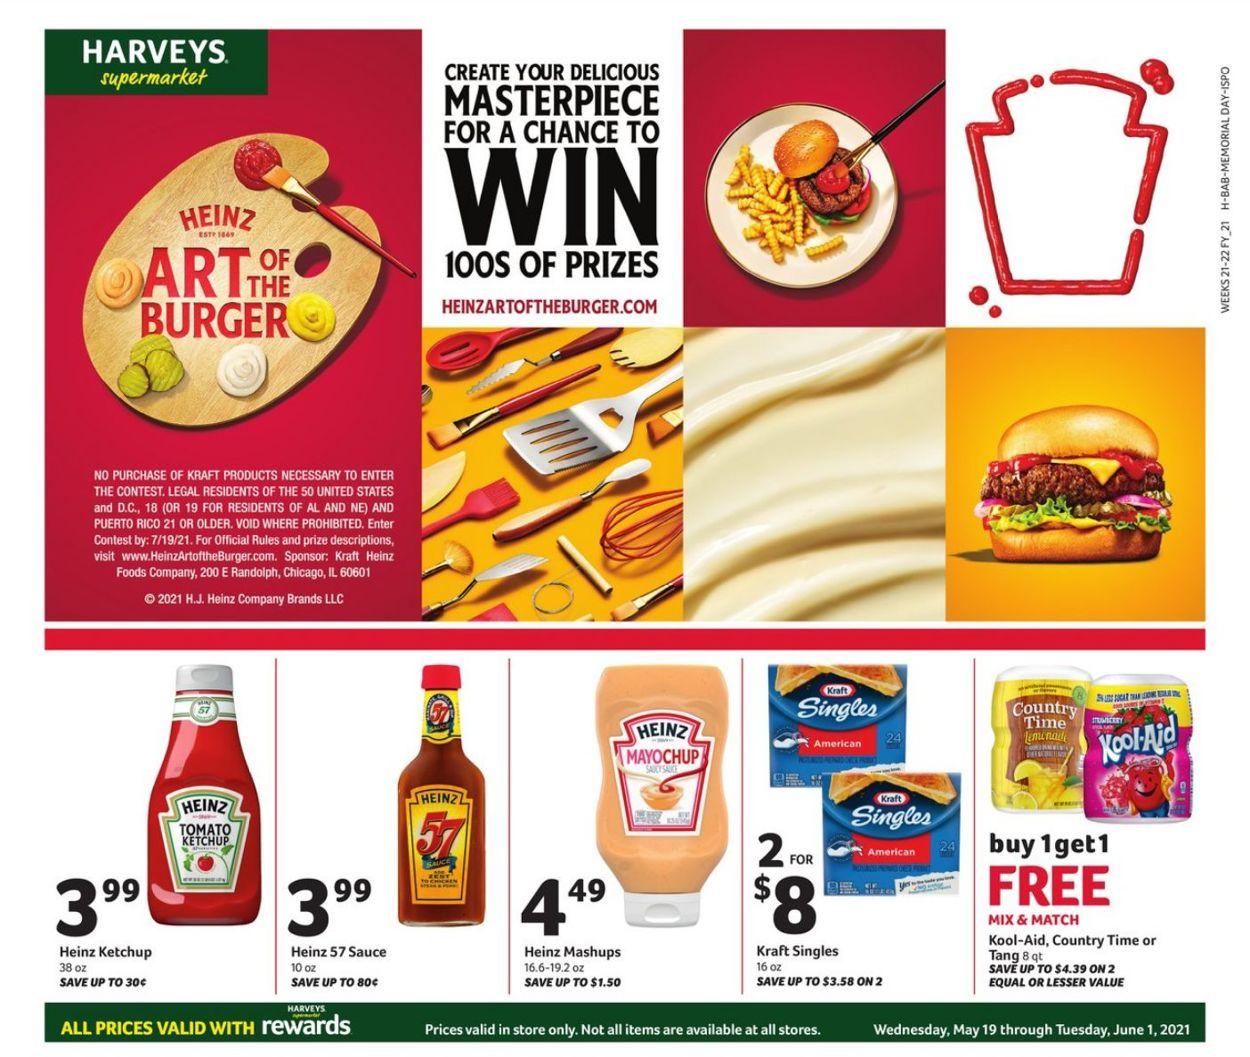 Harveys Supermarket Weekly Ad Circular - valid 05/19-06/01/2021